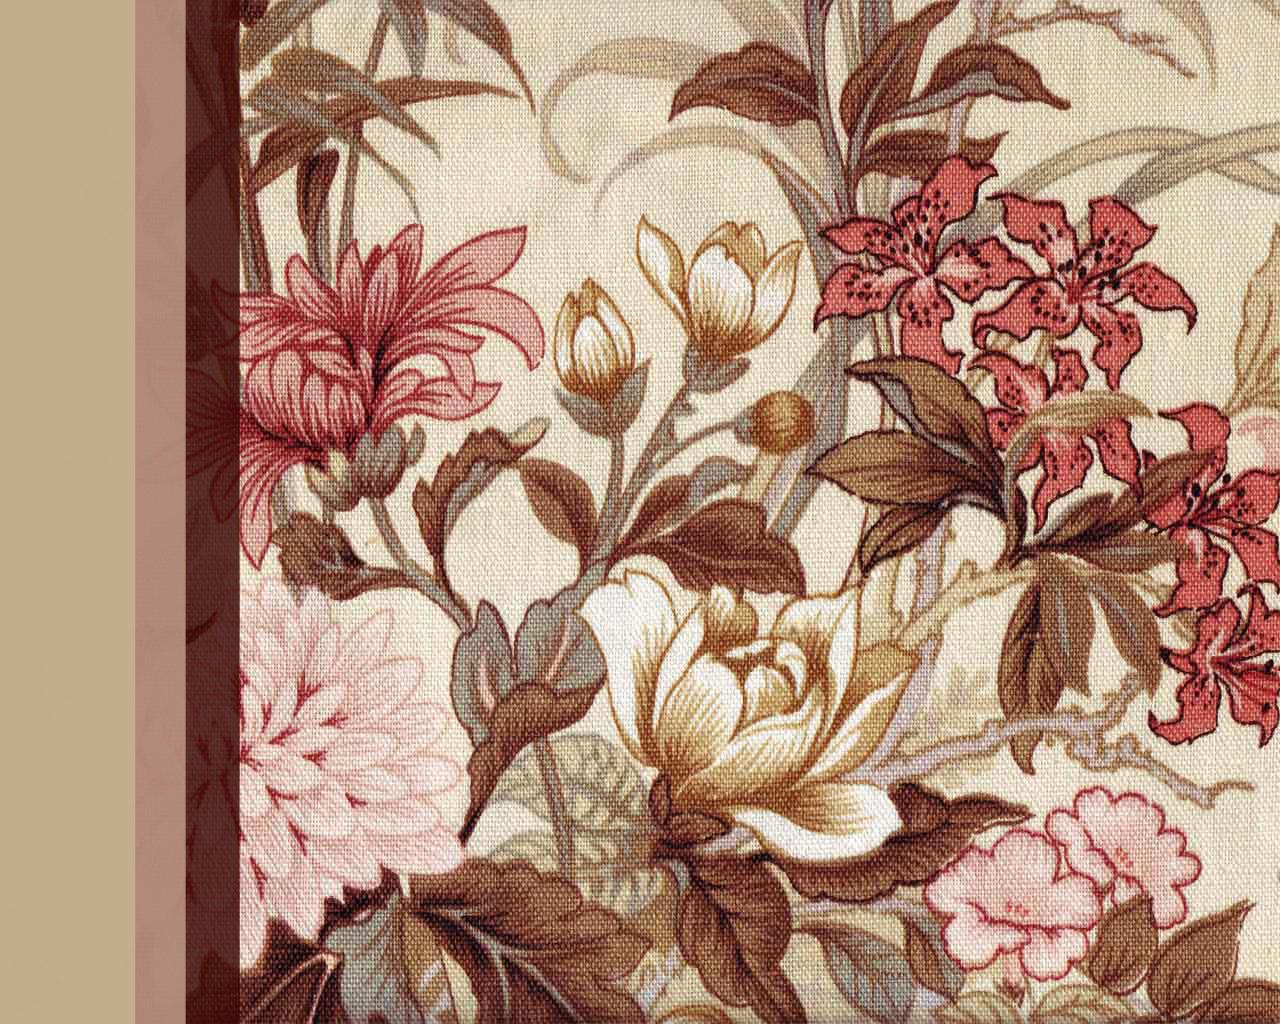 Old Fabric Wallpaper by chinofeliz